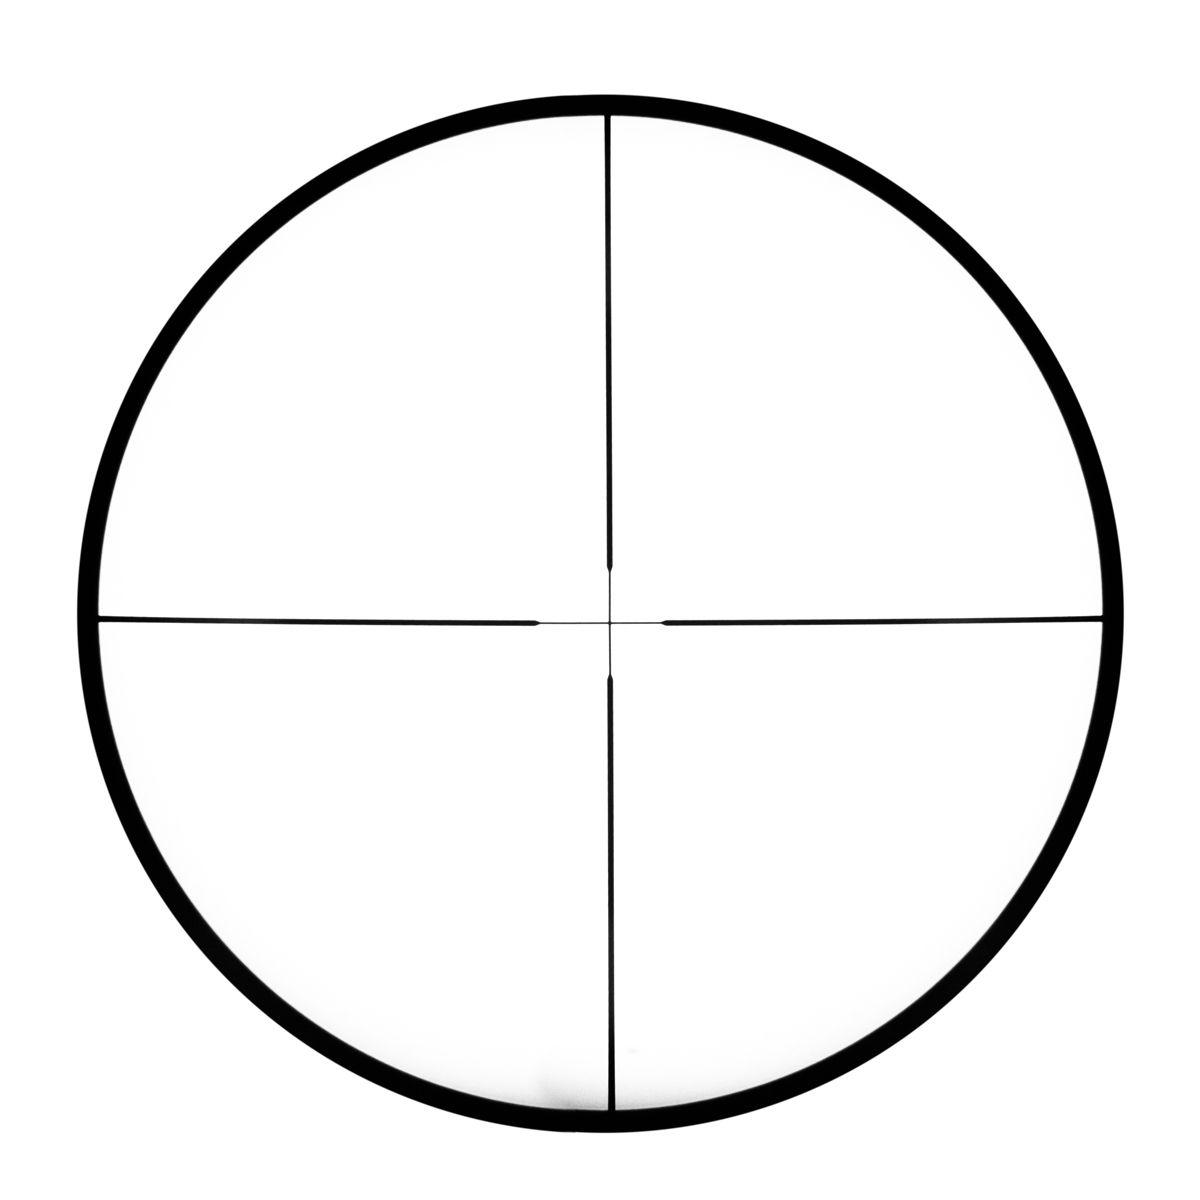 Luneta Para Carabinas Rossi 4x20 (Mounts3/8P)